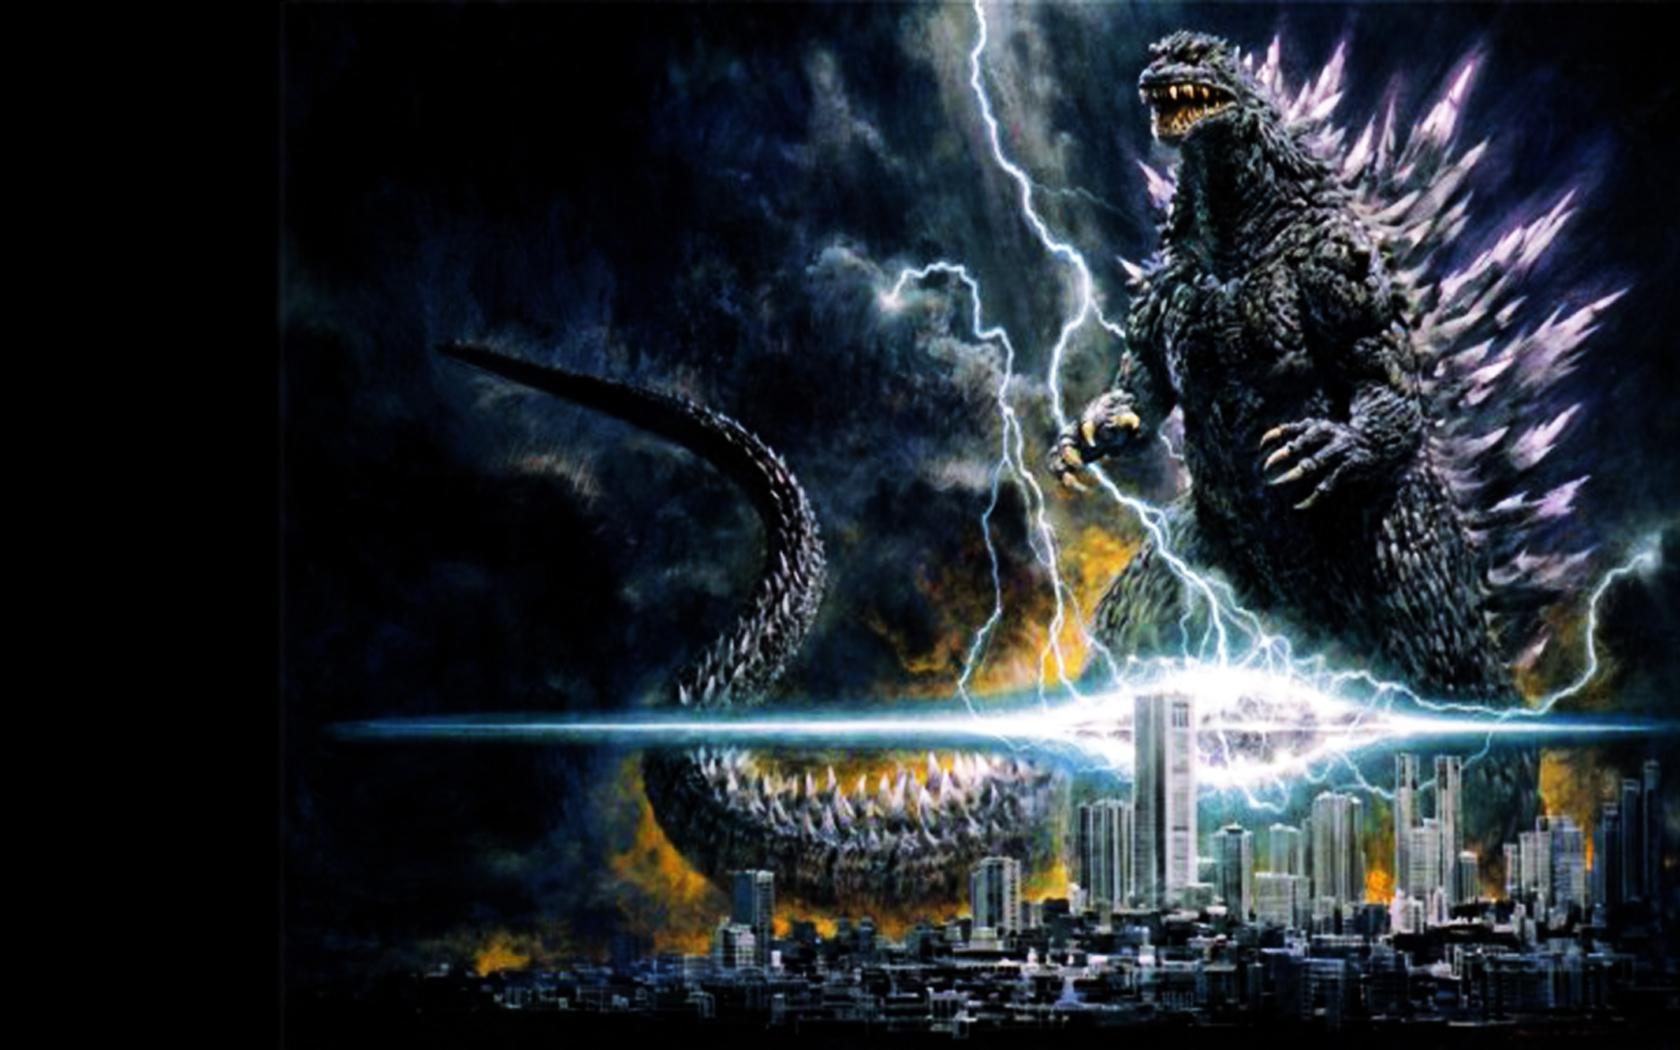 Godzilla Wallpaper 4 by Spitfire666xXxXx on deviantART 1680x1050